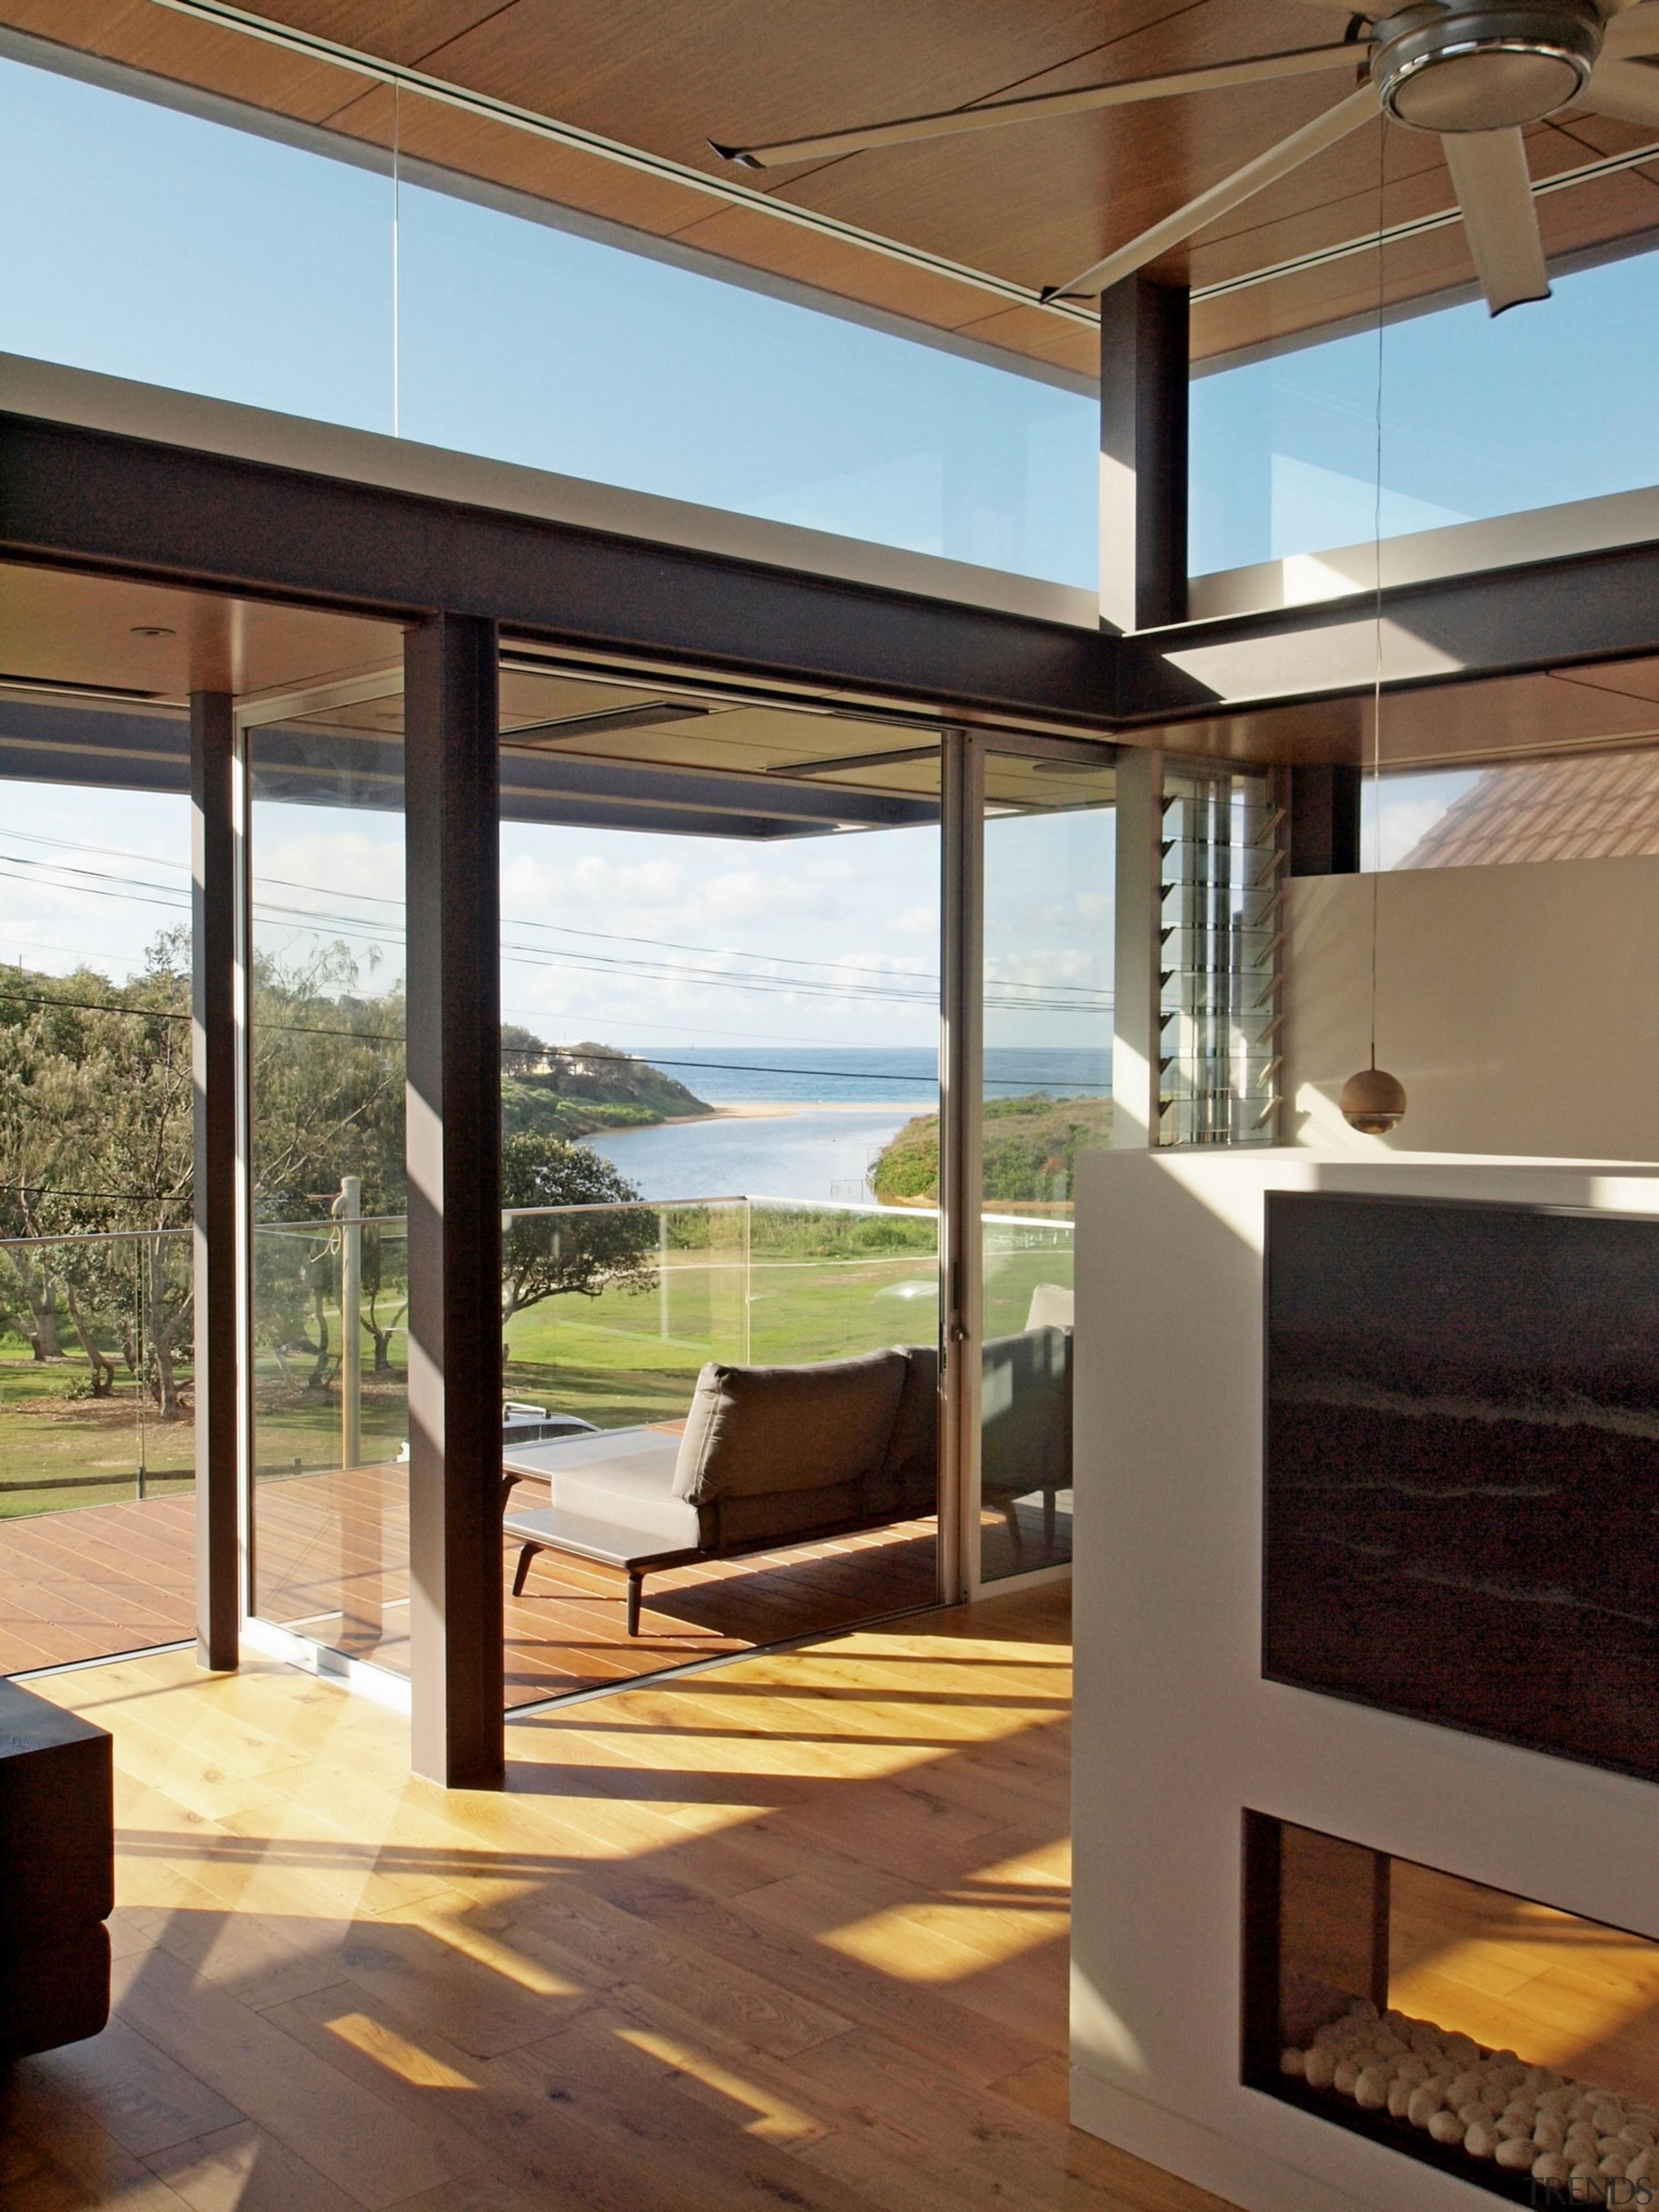 Roar Northcurlcurl House 16S - architecture | ceiling architecture, ceiling, house, interior design, real estate, window, brown